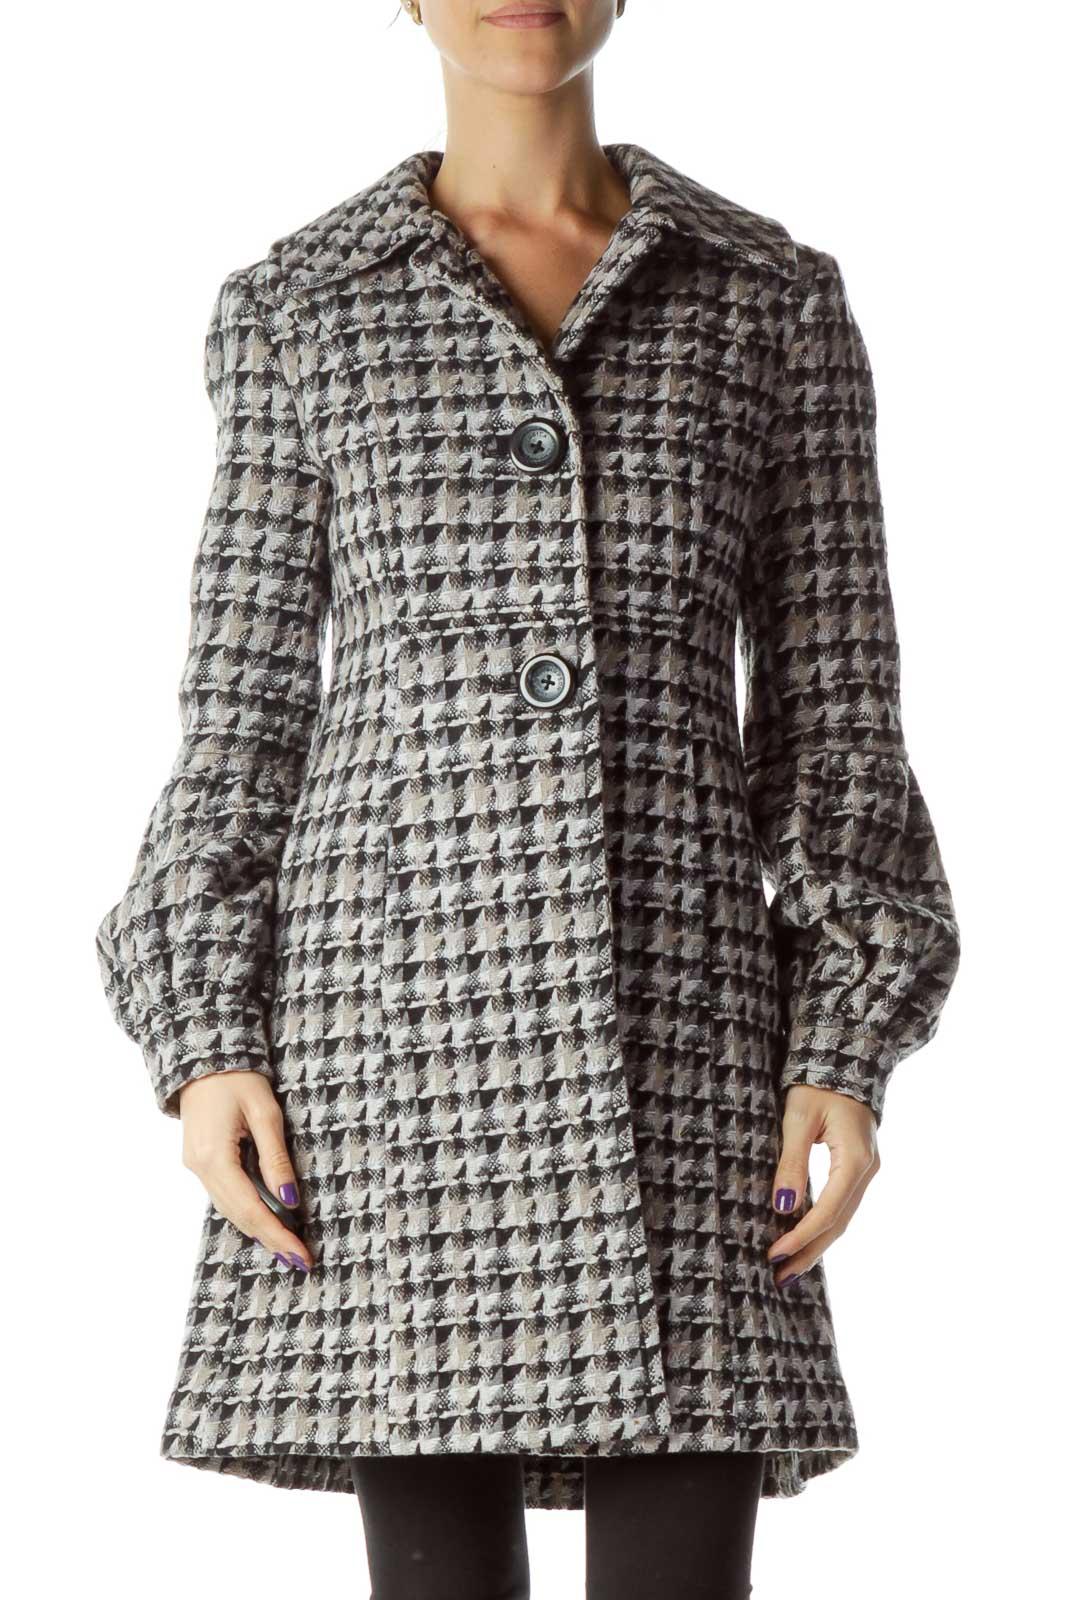 Gray Pattern Knit Coat Front